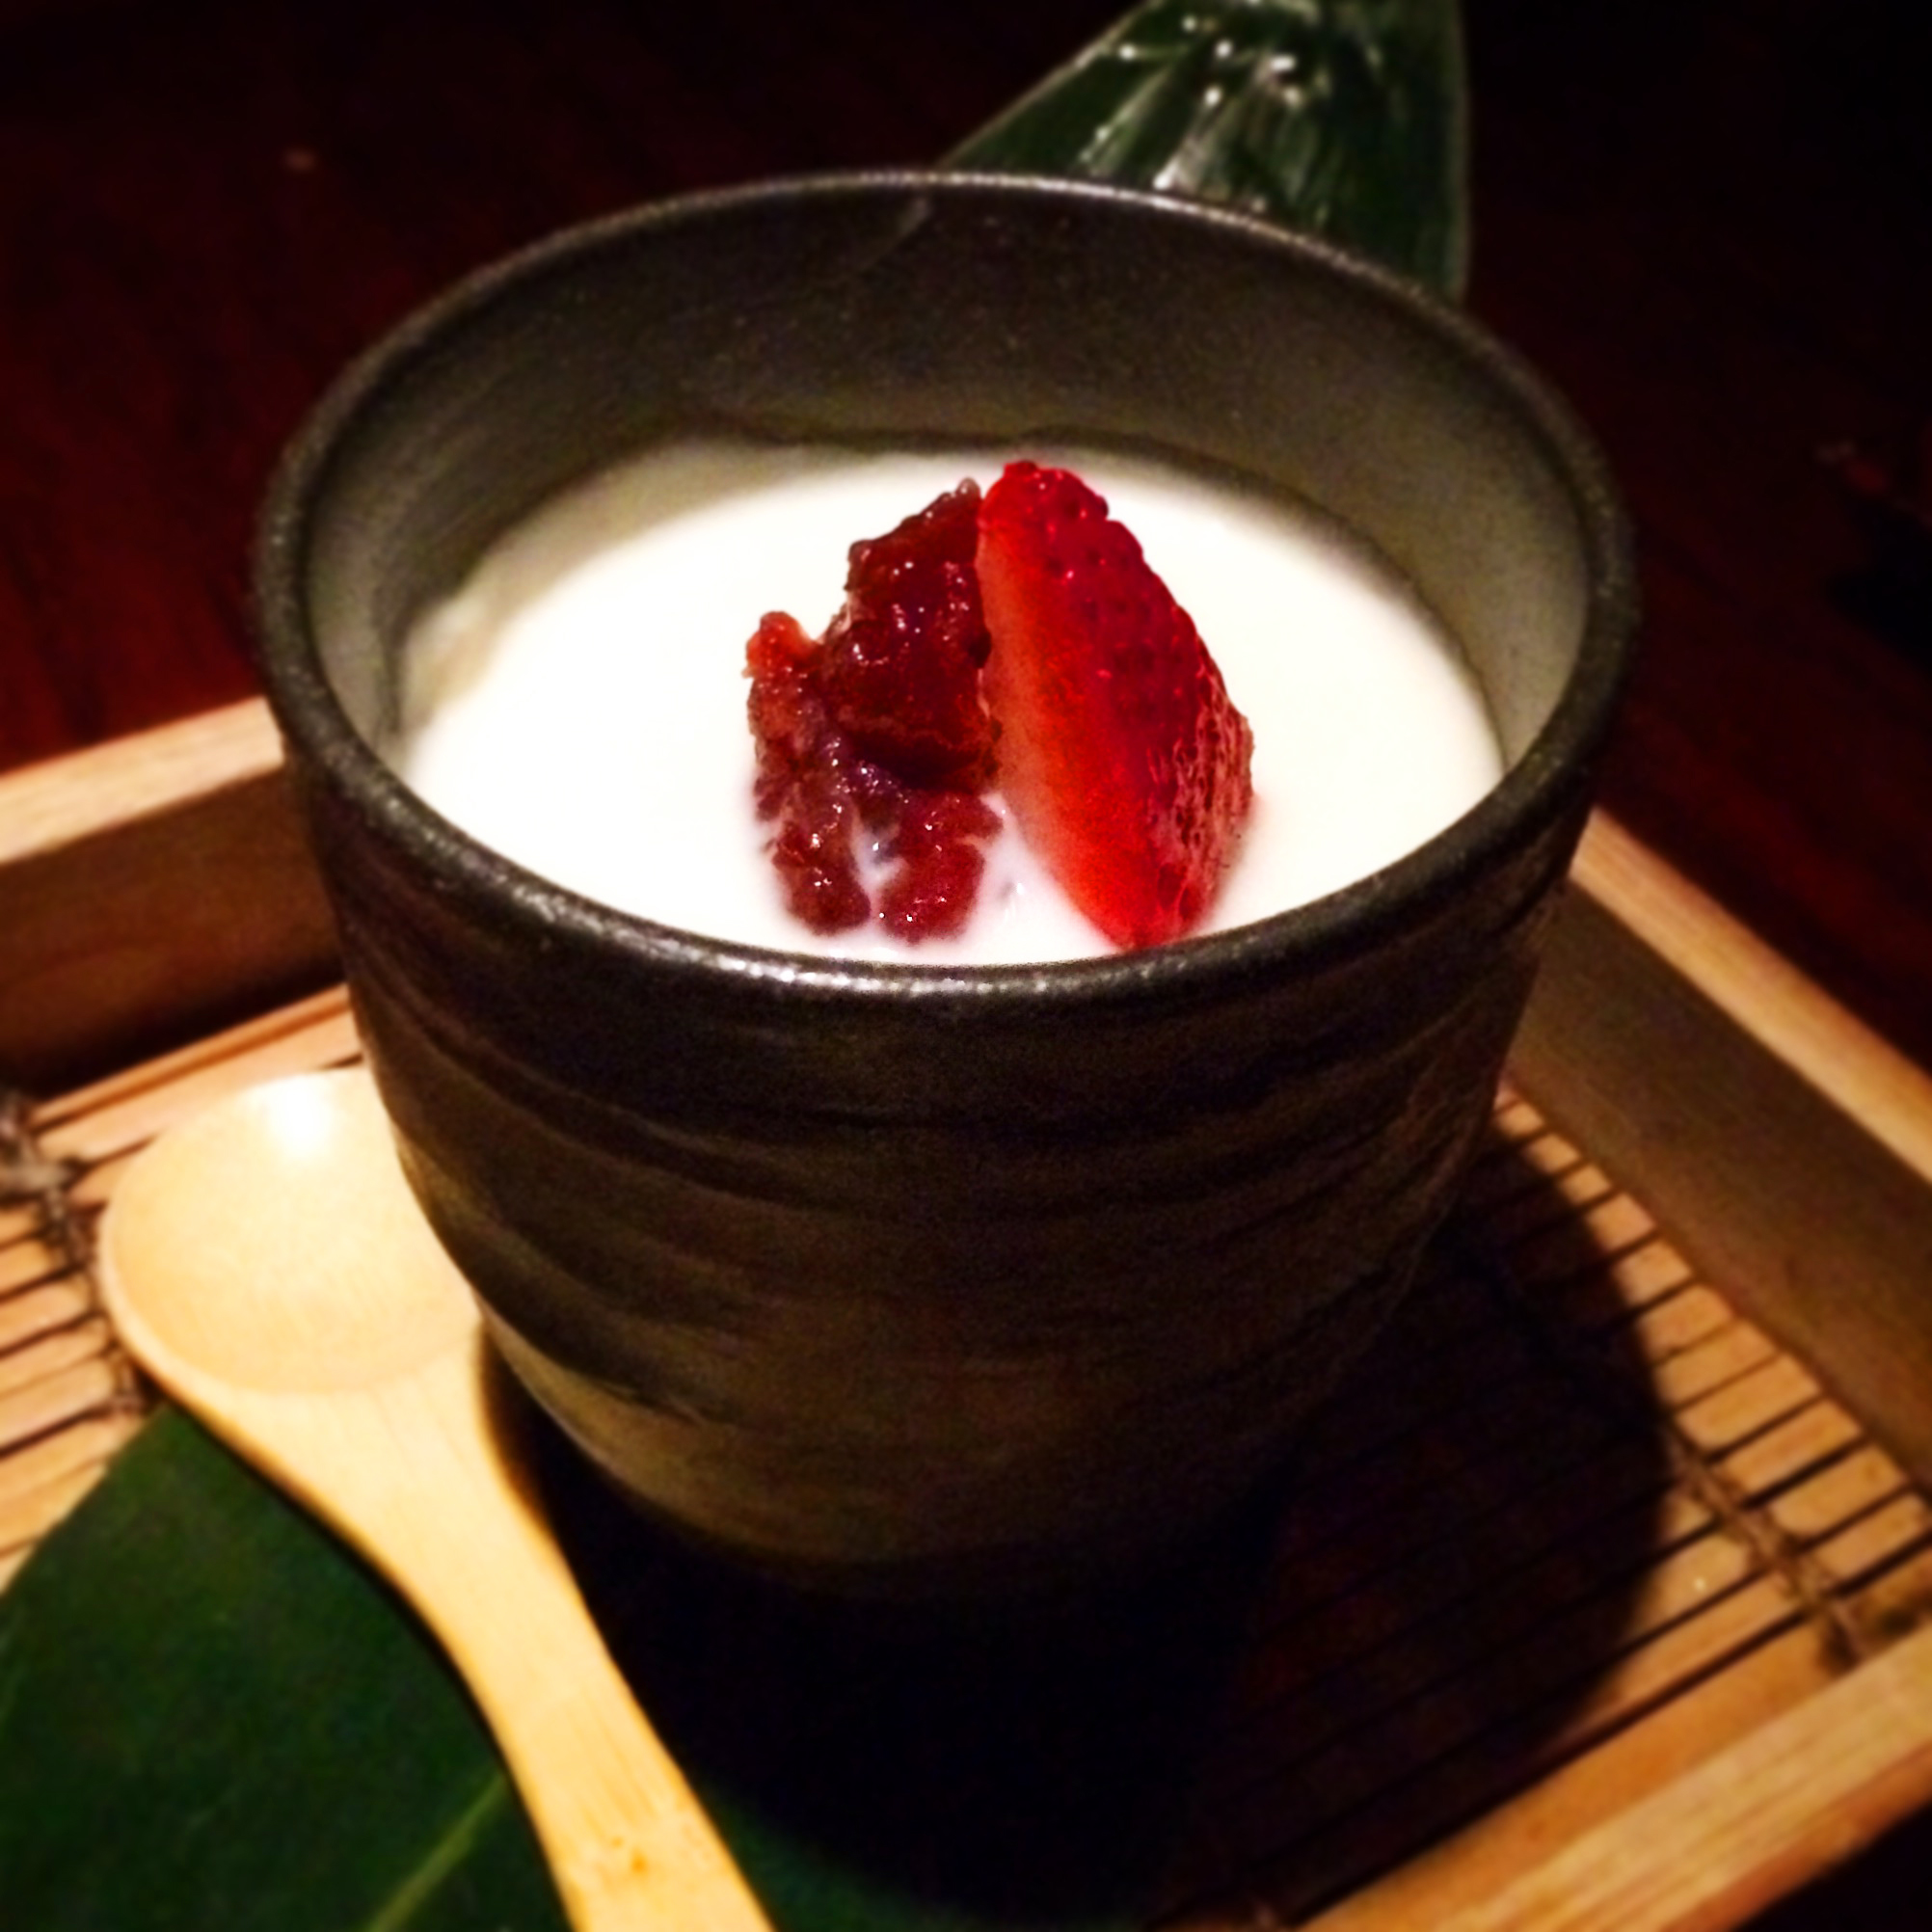 House made tofu desert, best use of tofu ever.